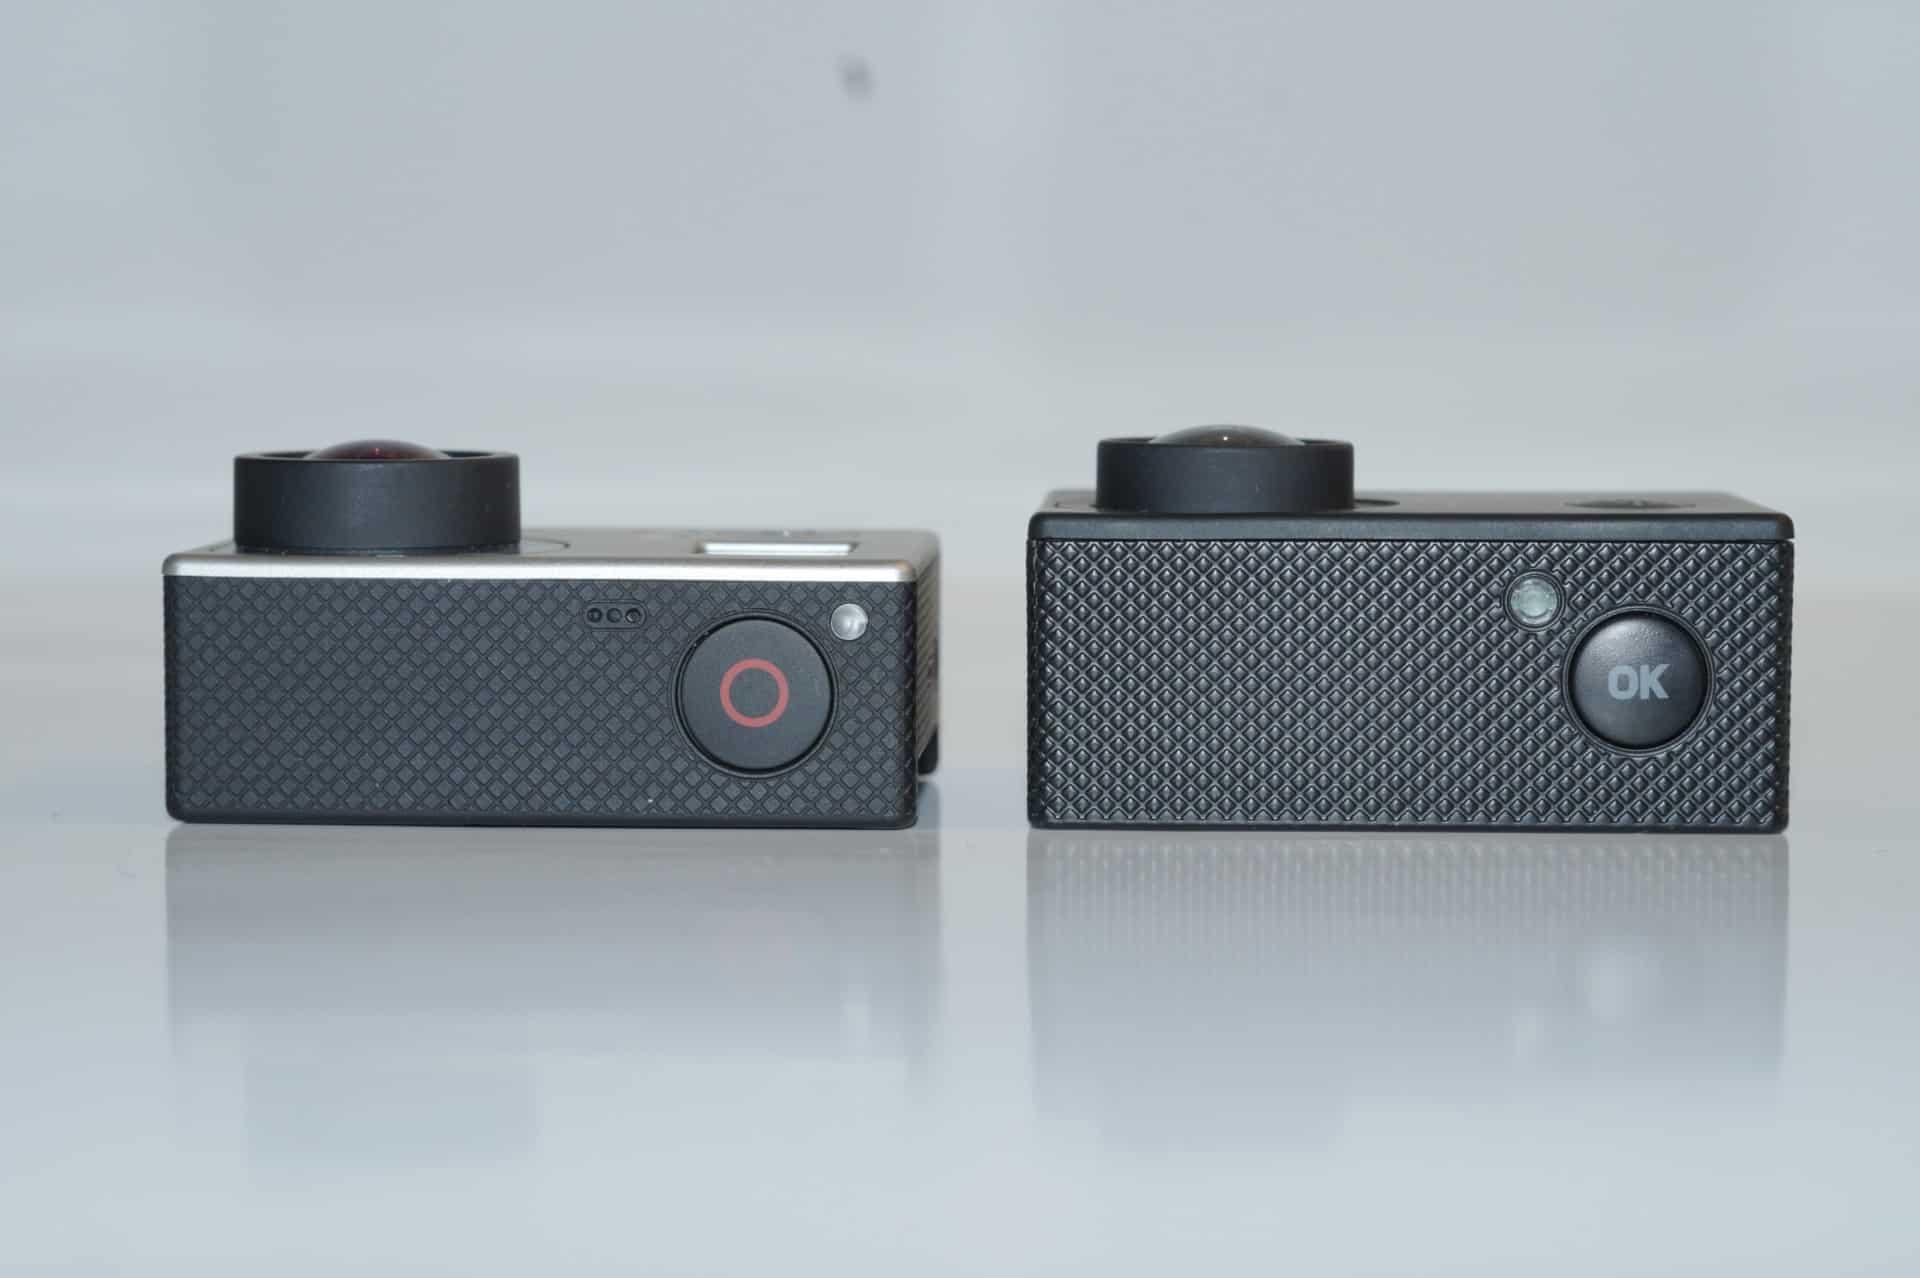 qumox vs gopro der action kamera vergleich bergreif. Black Bedroom Furniture Sets. Home Design Ideas